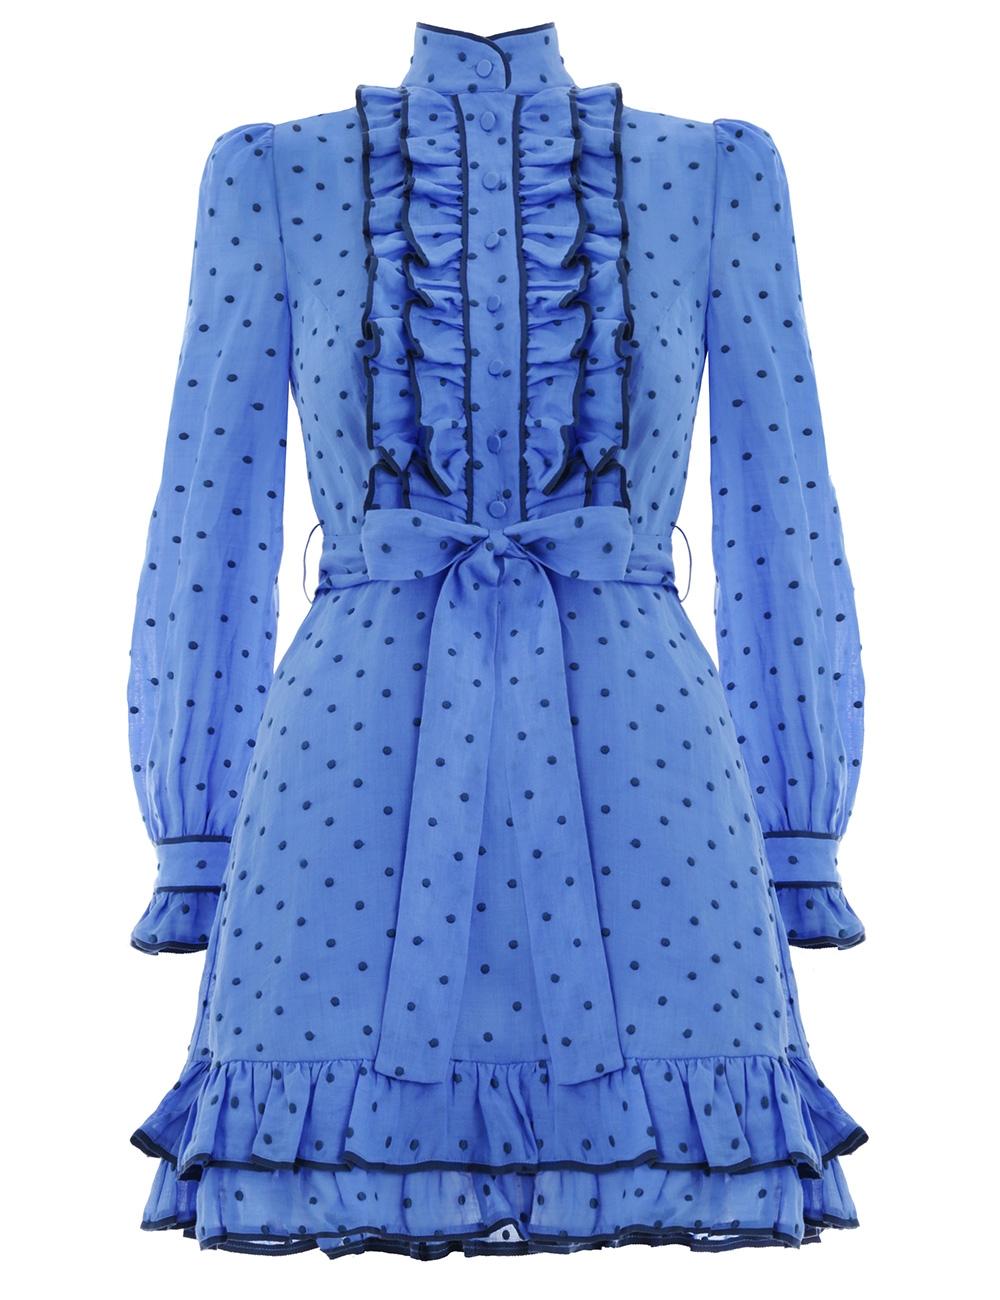 9bc09bb7843cac 1.5788dmon.cpd.cornflower_polka_dot-moncour-ruffle-shirt-dress -flat.jpg?width=500&height=645&canvas=500:645&quality=100&bg-color=255,255,255&fit=bounds